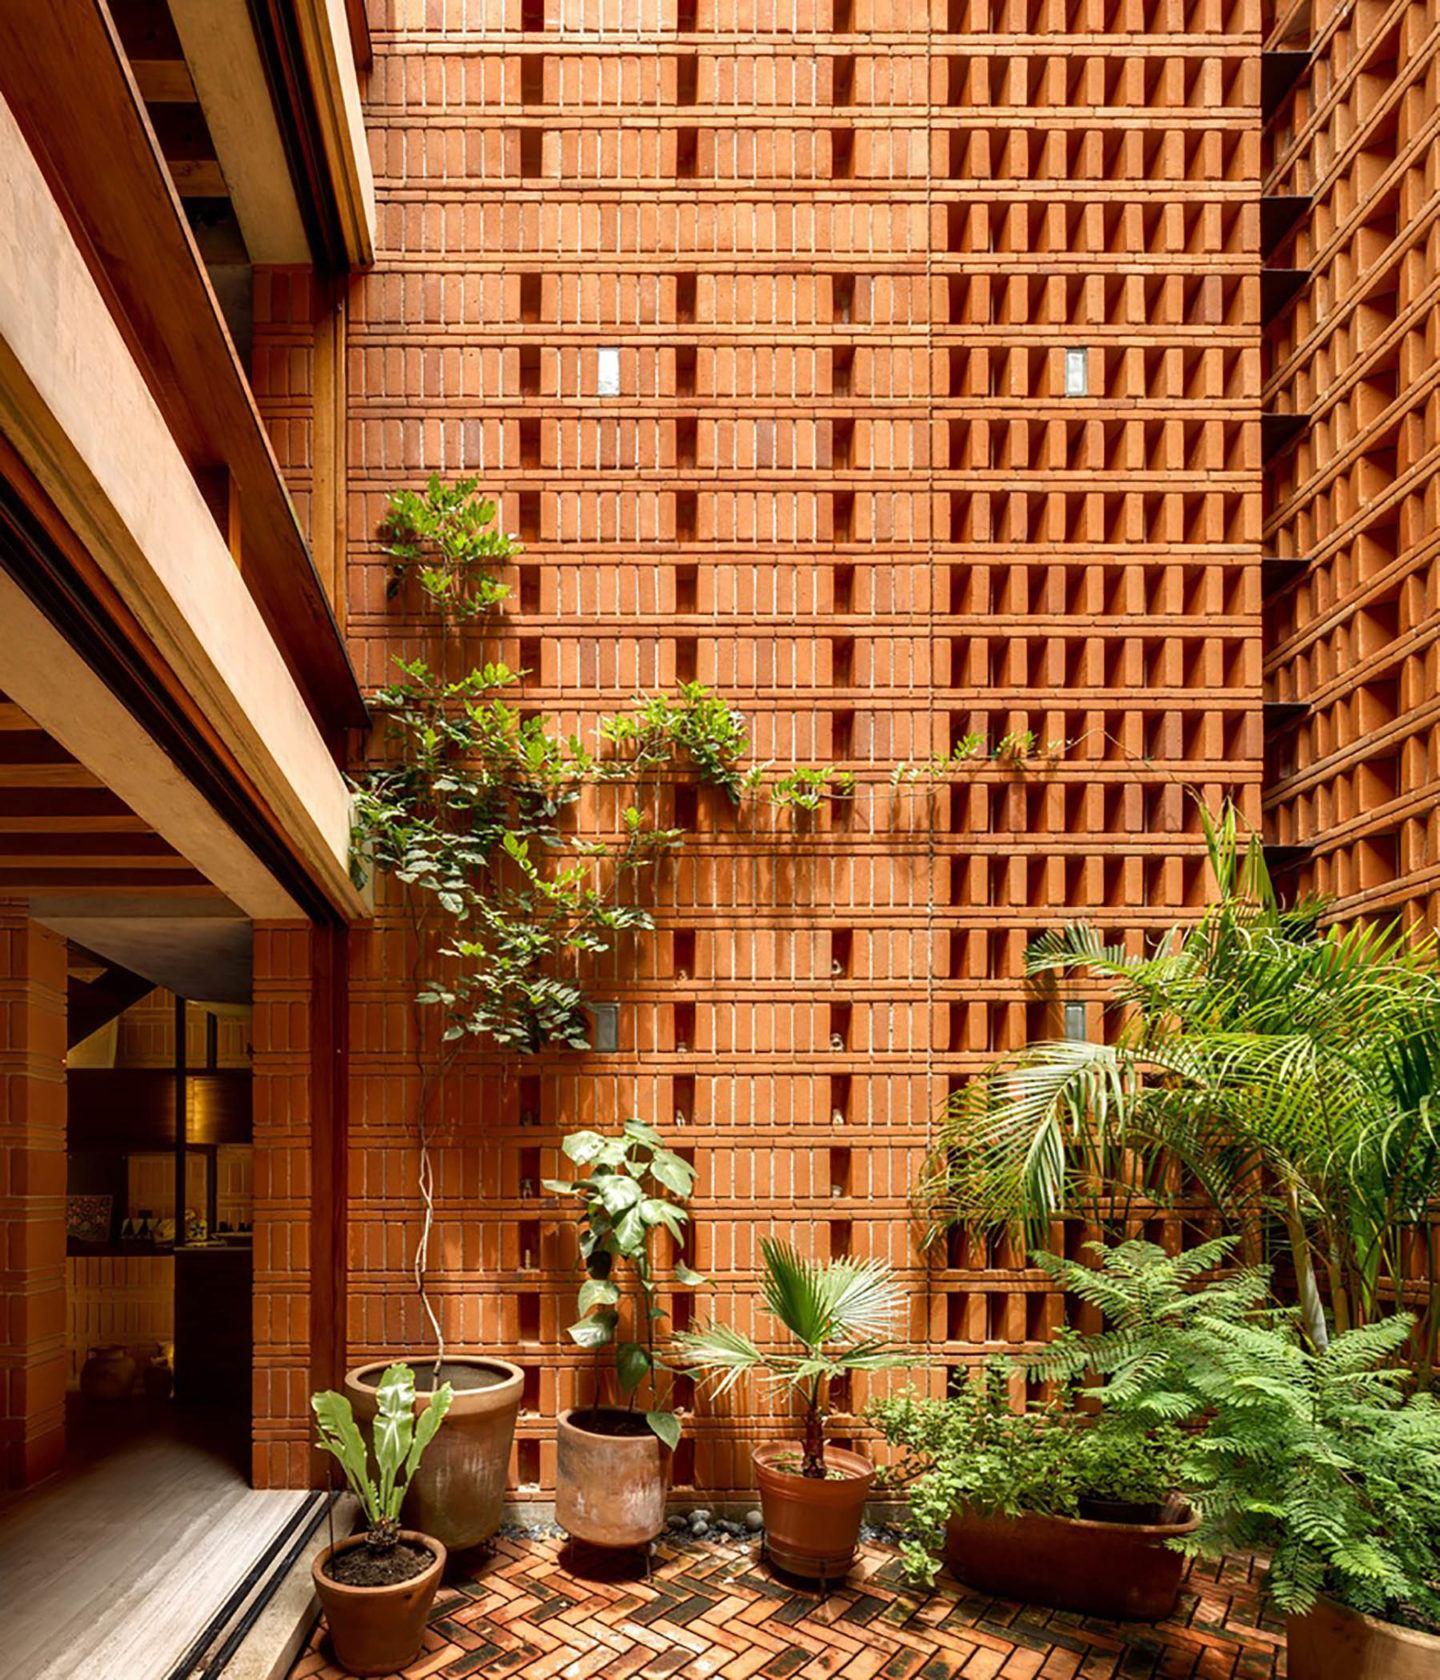 IGNANT-Architecture-Taller-De-Arquitectura-Mauricio-Rocha-Gabriela-Carrillo-Iturbide-Studio-18